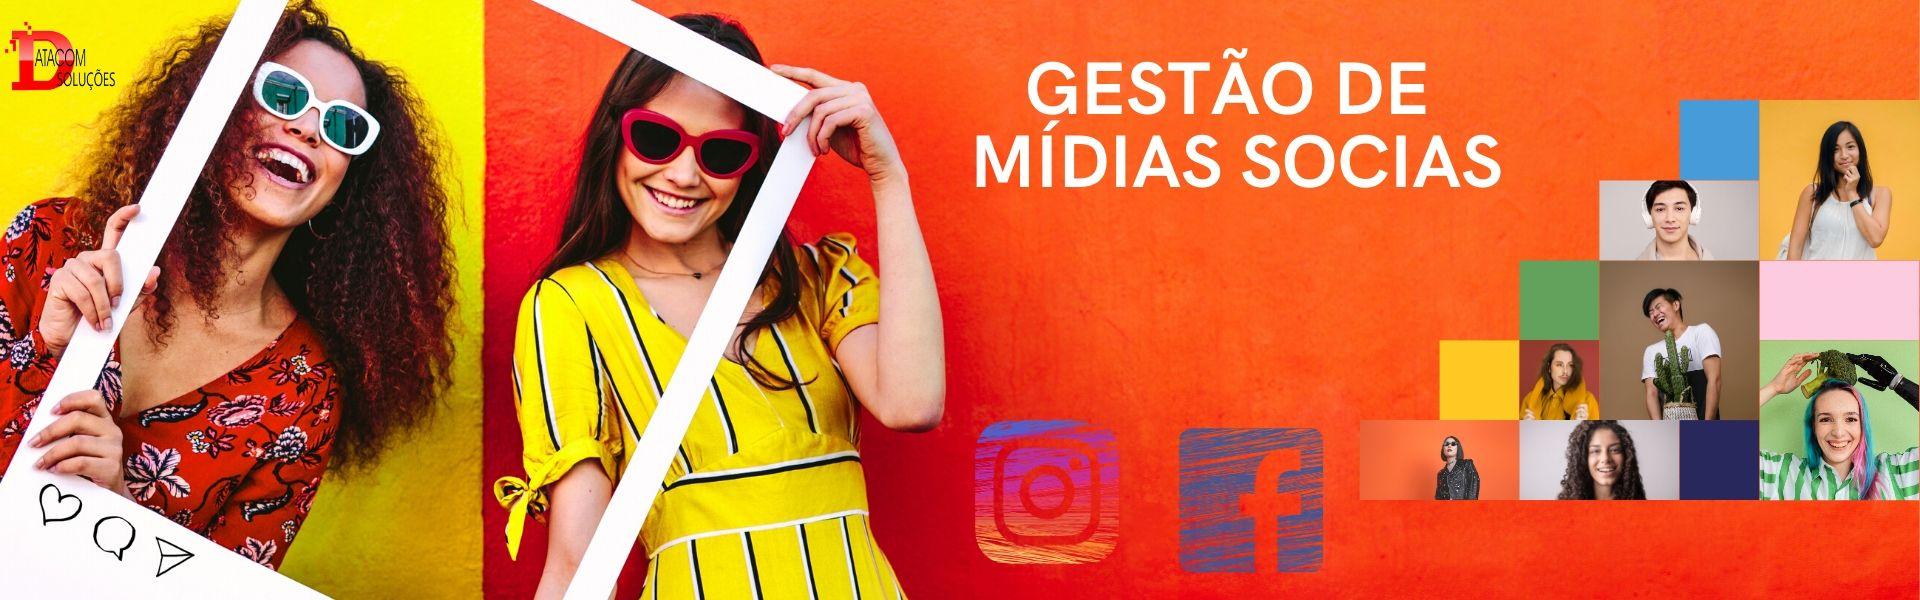 gestao-midias-sociais-facebook-instagram-youtube-datacom-solucoes